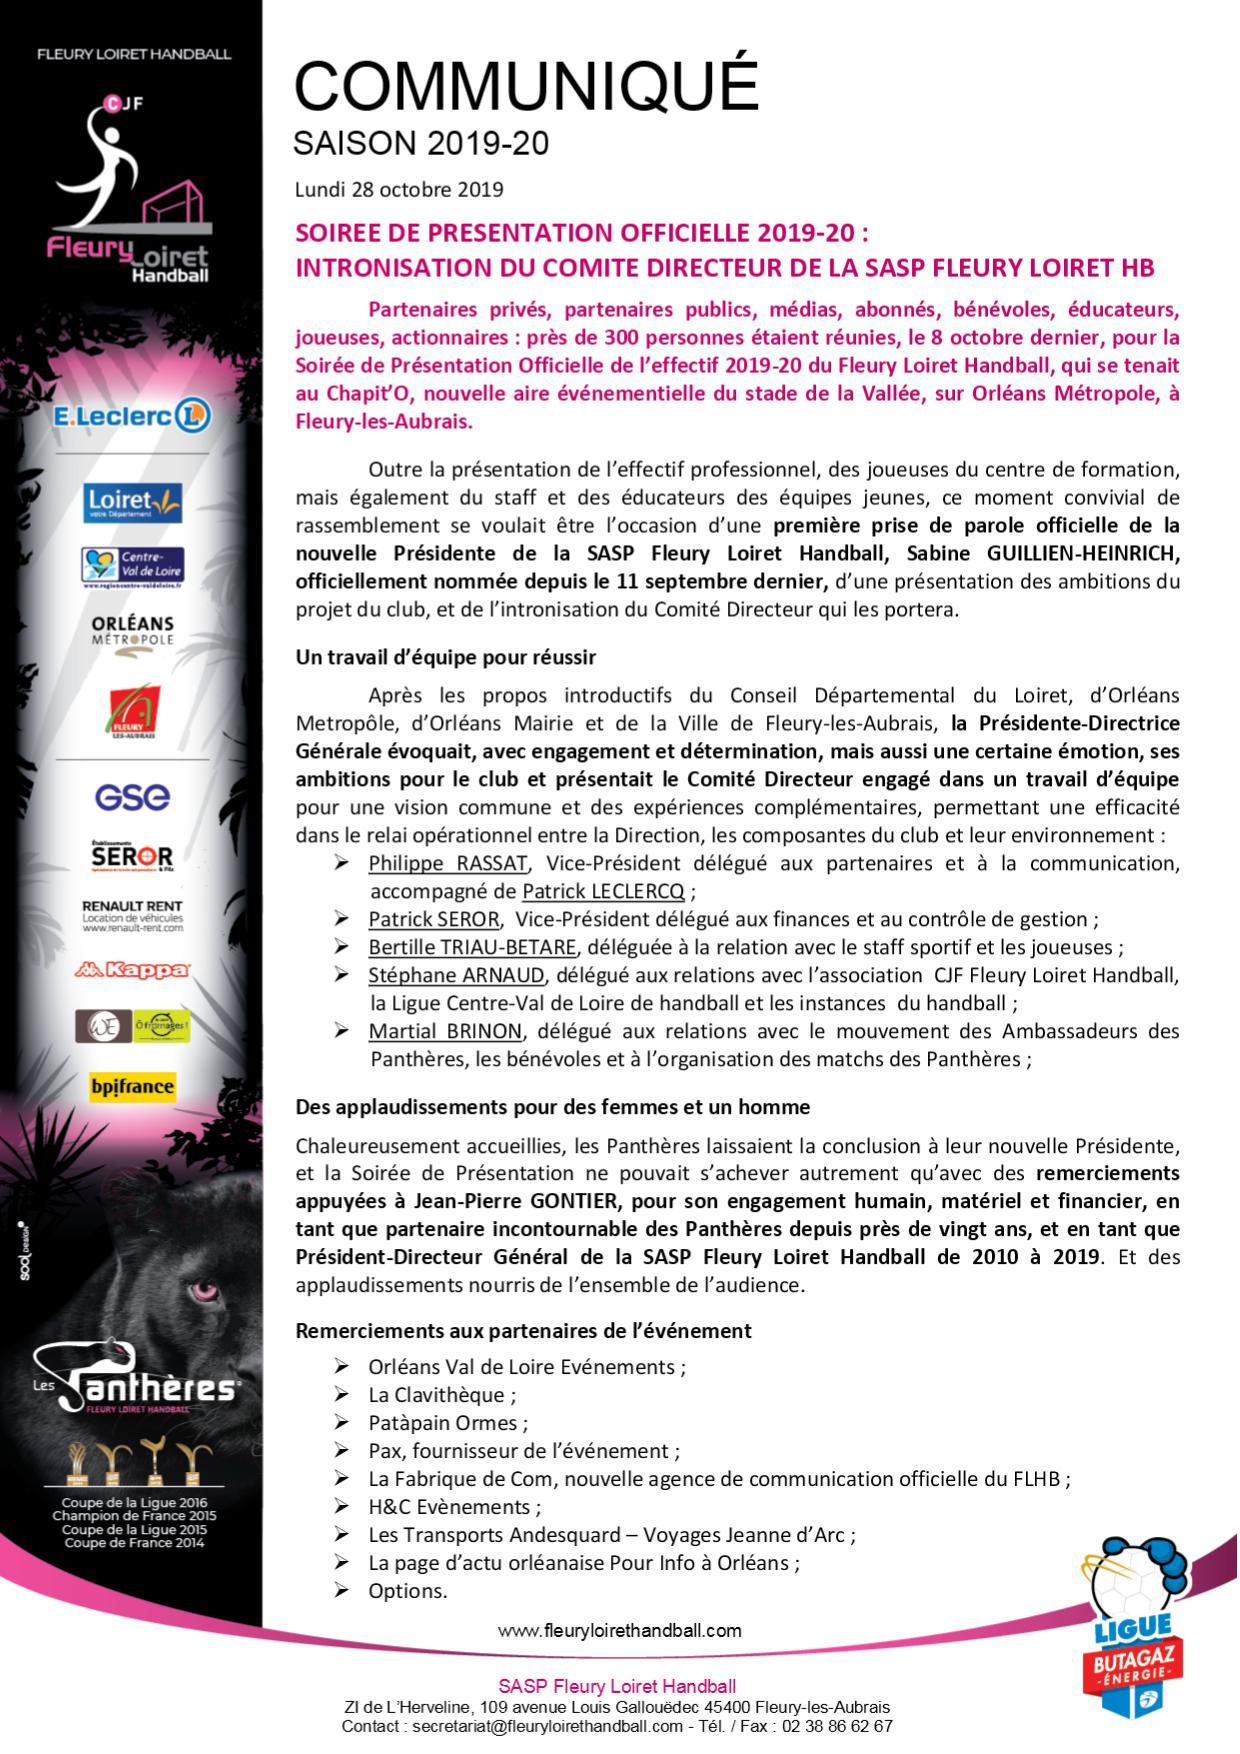 Aout 2015 - Communiqué Fleury Loiret Handball - Lundi 28 octobre 2019.jpg